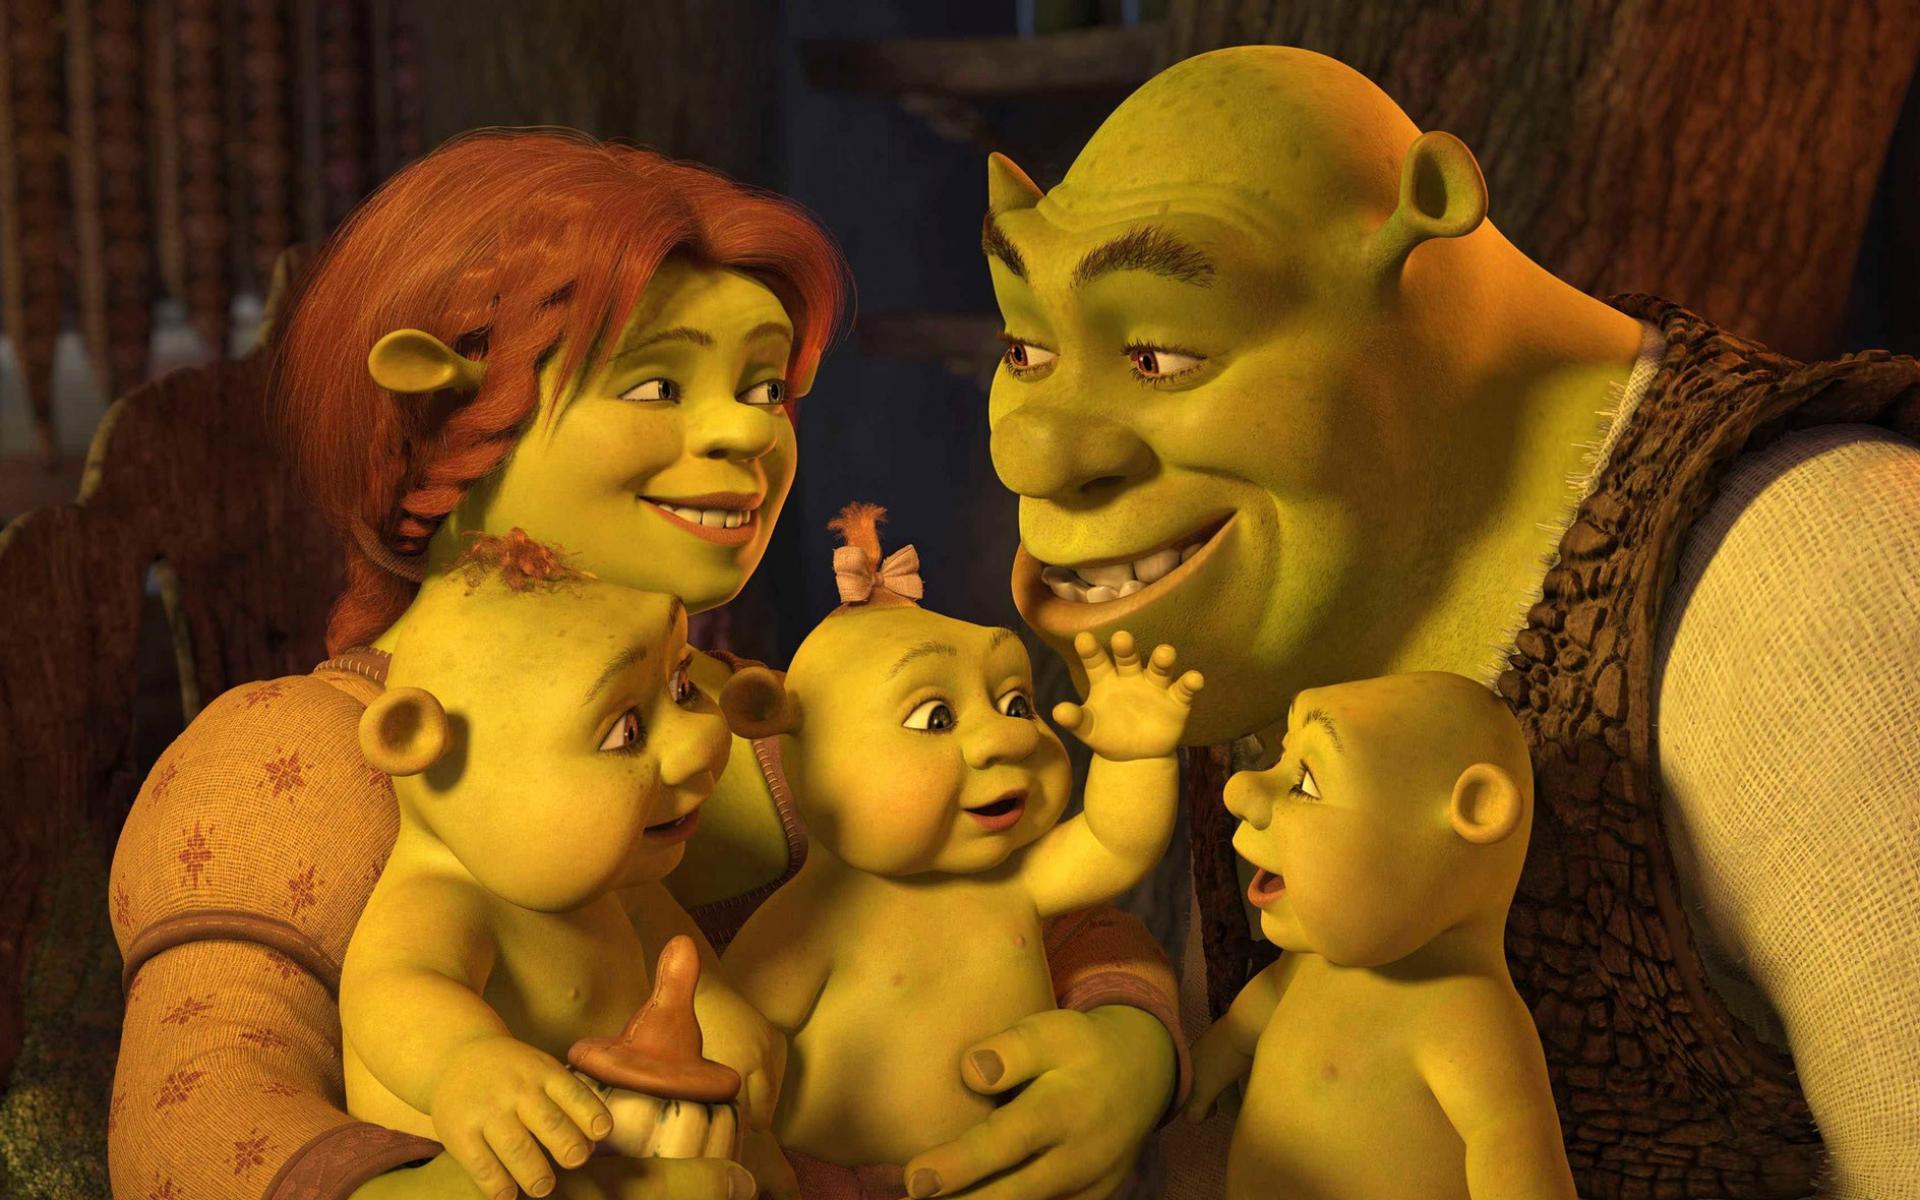 Shrek sexpictures nude gallery